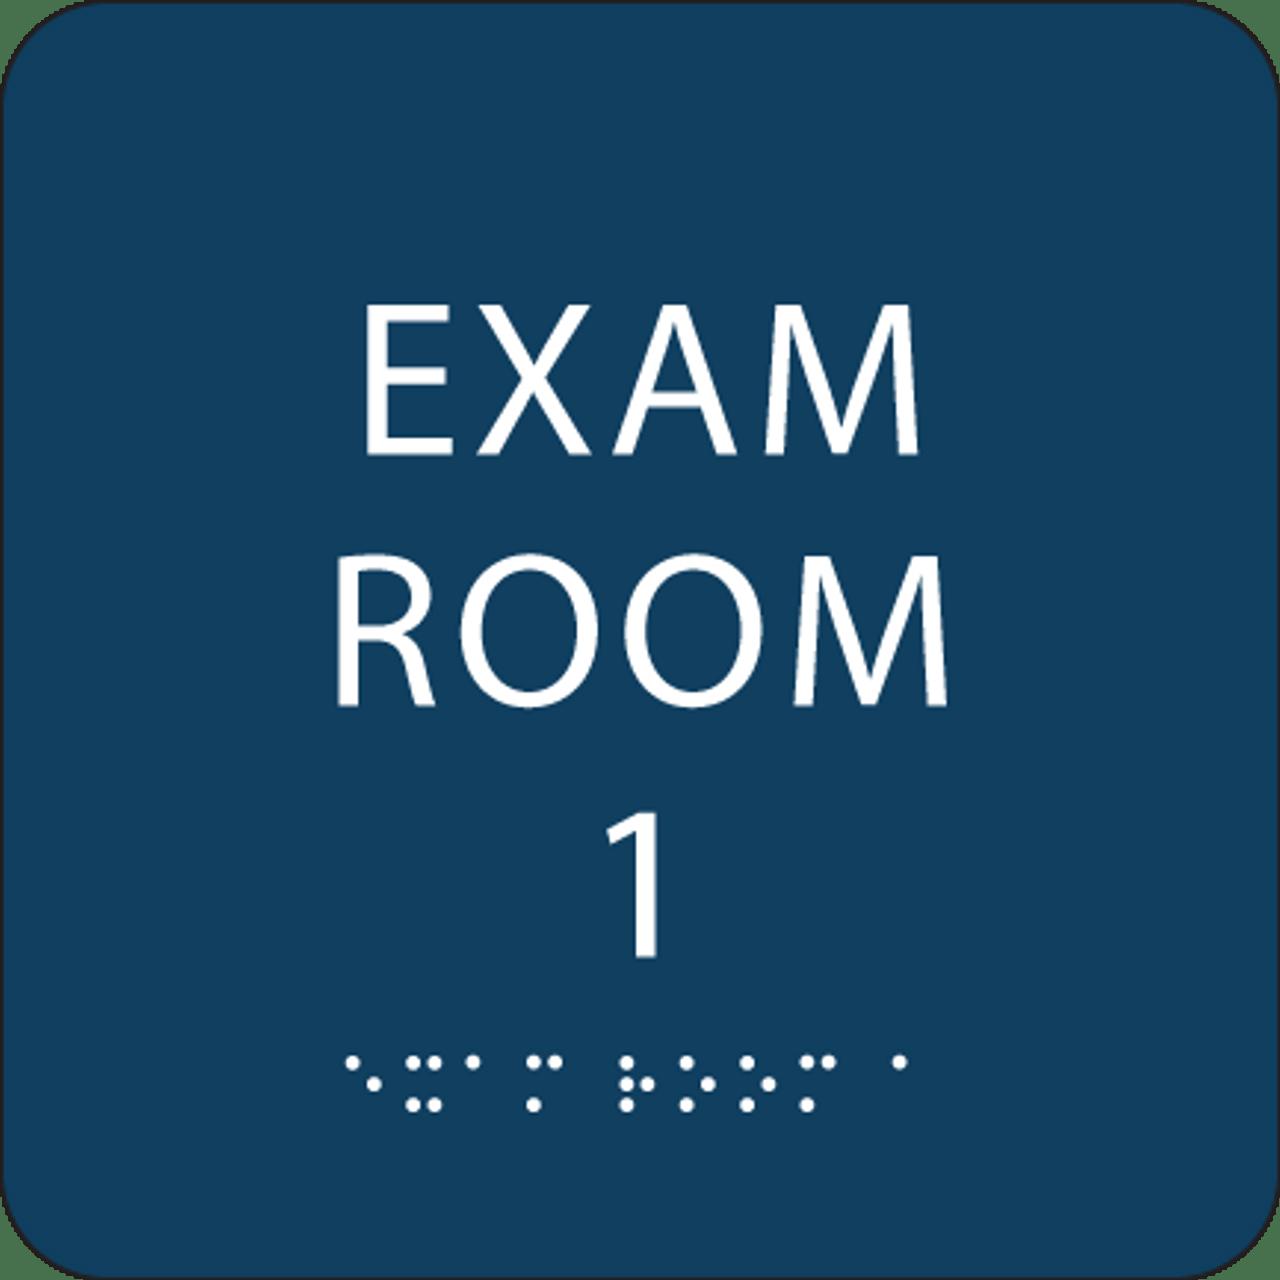 Dark Blue Exam Room 1 ADA Sign